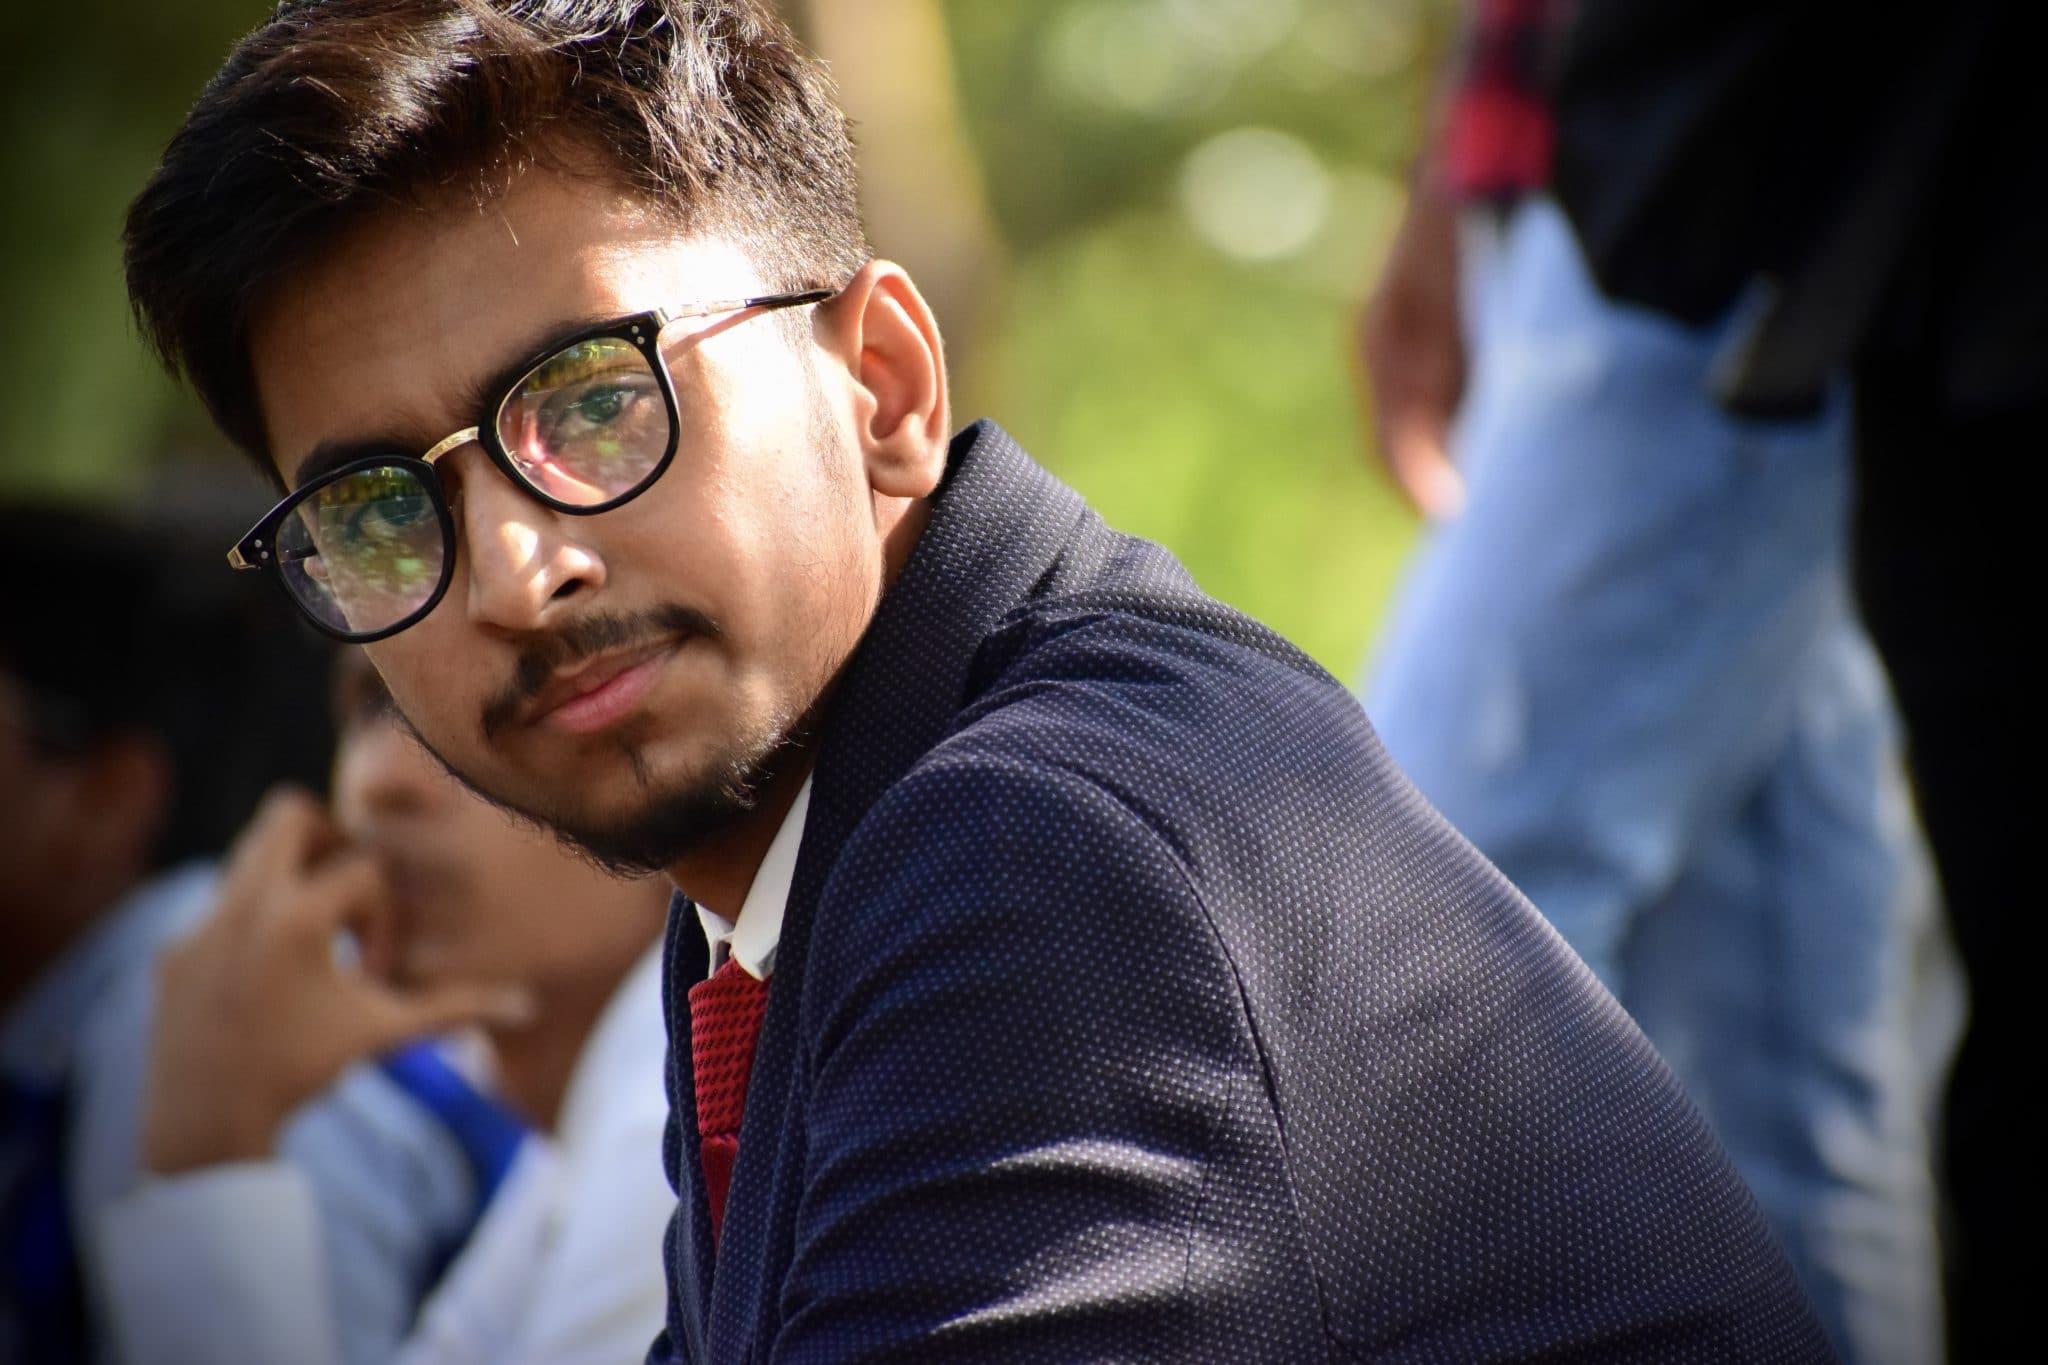 Rajkumar Shukla CosmosNow